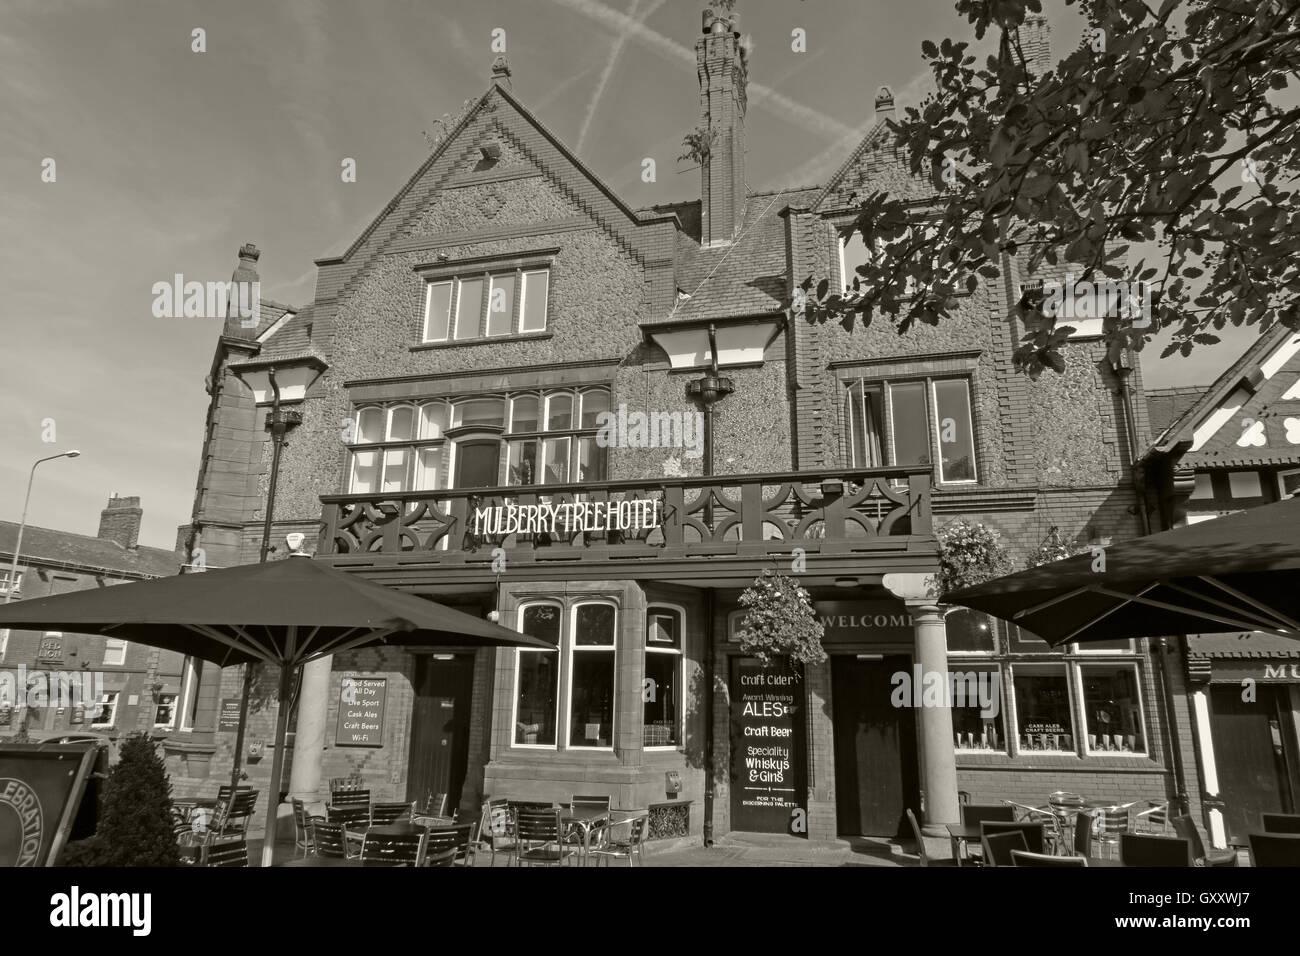 Mulberry Tree Pub,Stockton Heath,South Warrington,Cheshire,England,UK B/W Stock Photo